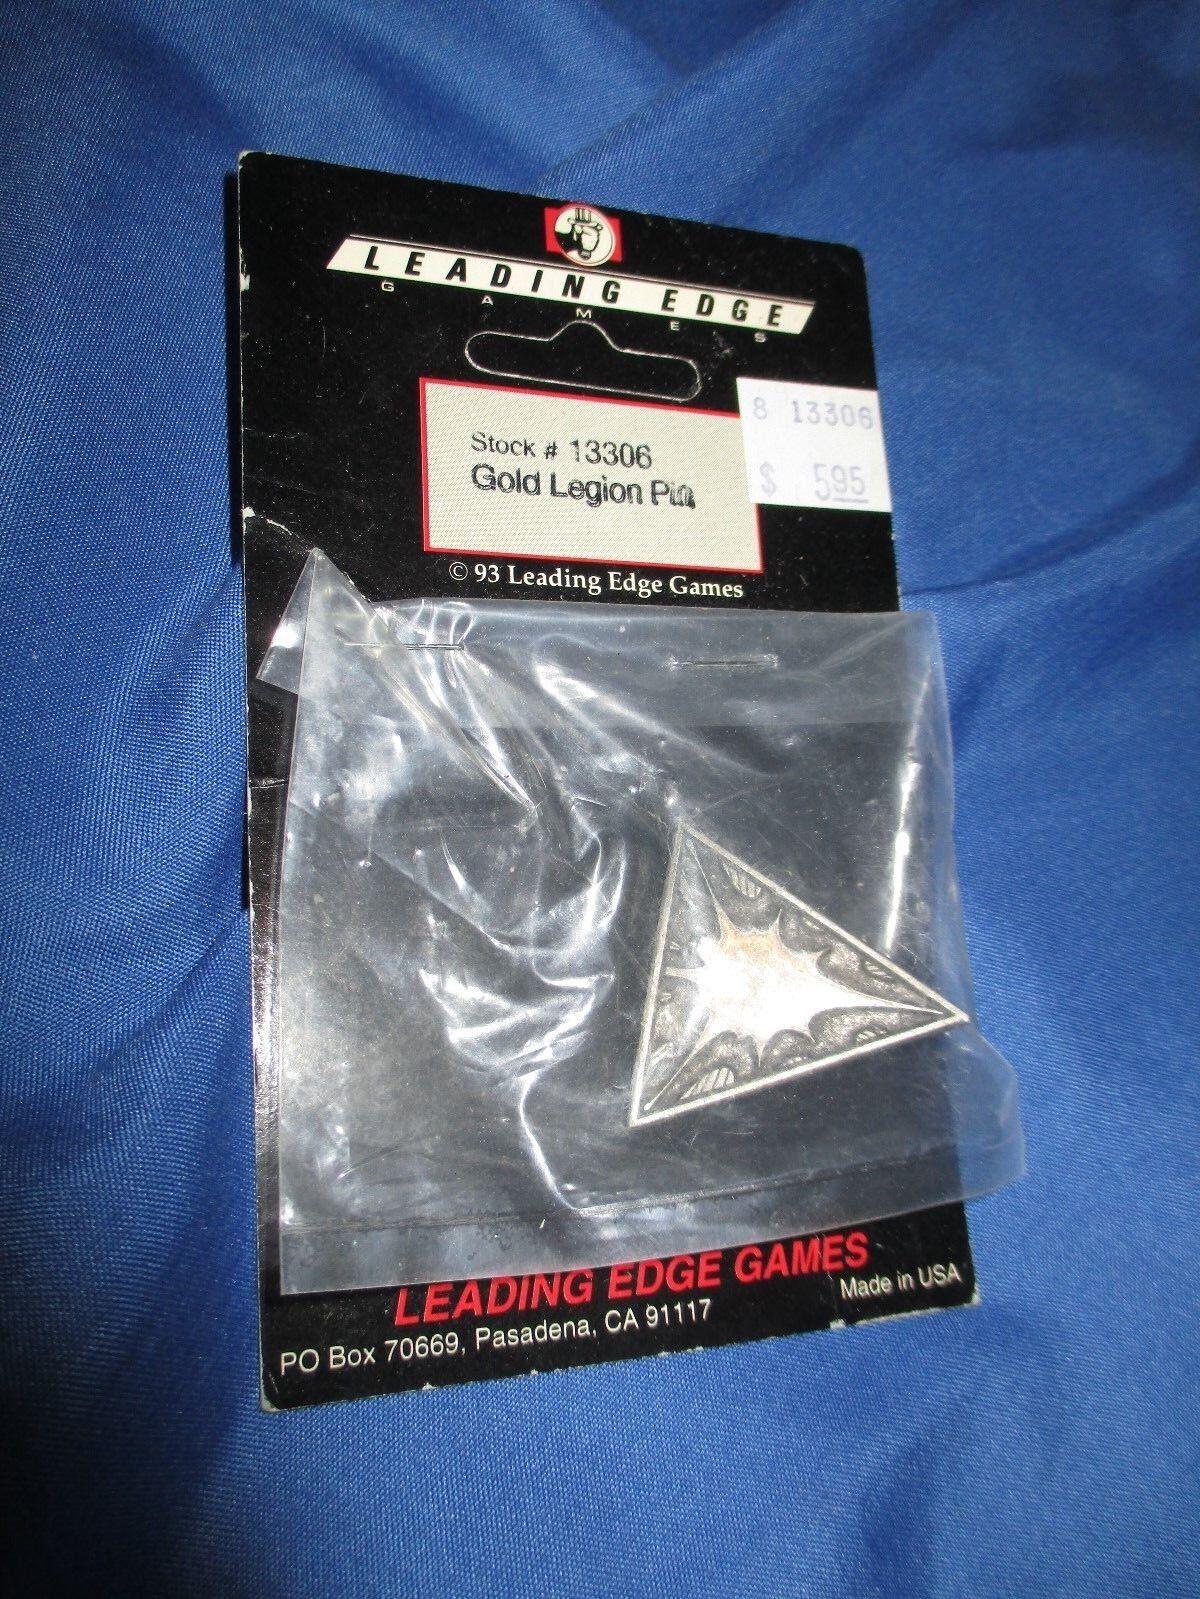 LEADING EDGE GAMES 1993 Red Legion Pin